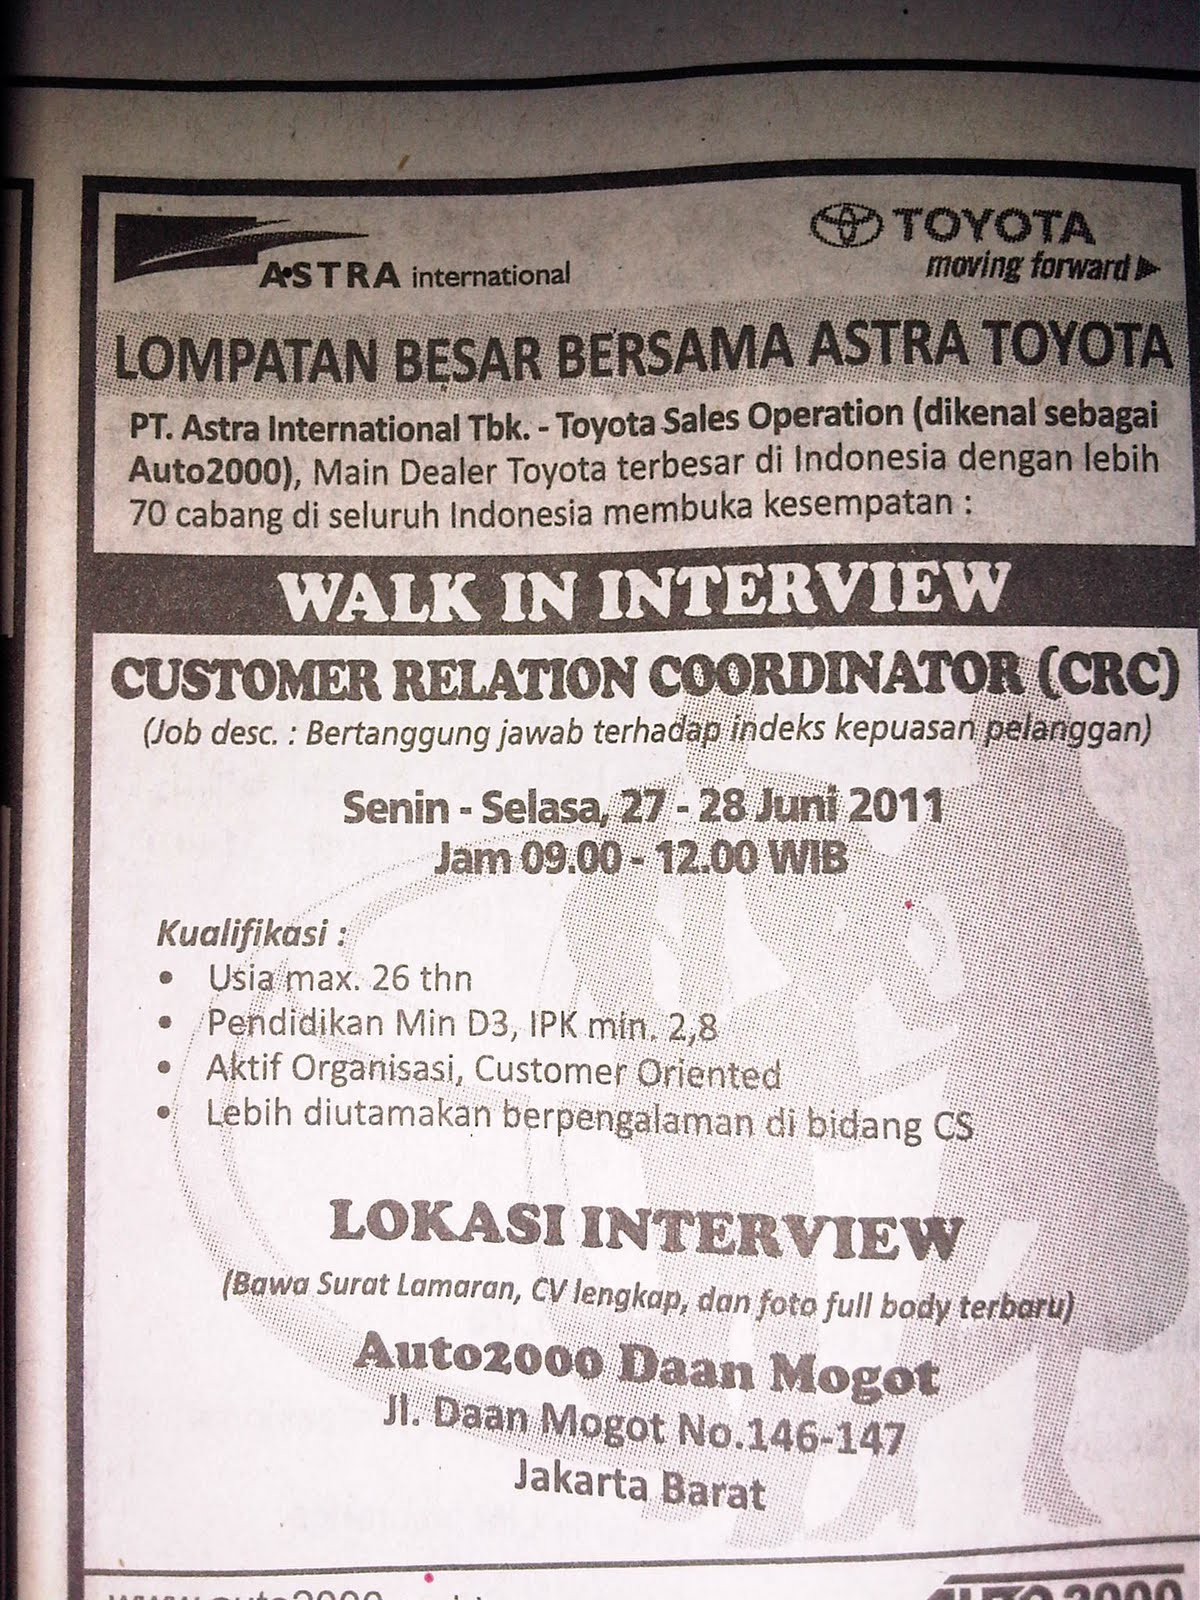 Loker 2013 Untuk Lulusan Smp Portal Info Lowongan Kerja Di Yogyakarta Terbaru 2016 Diposkan Oleh Nugroho Sulistyo Di 435 Am Lowongan Kerja Loker Terbaru